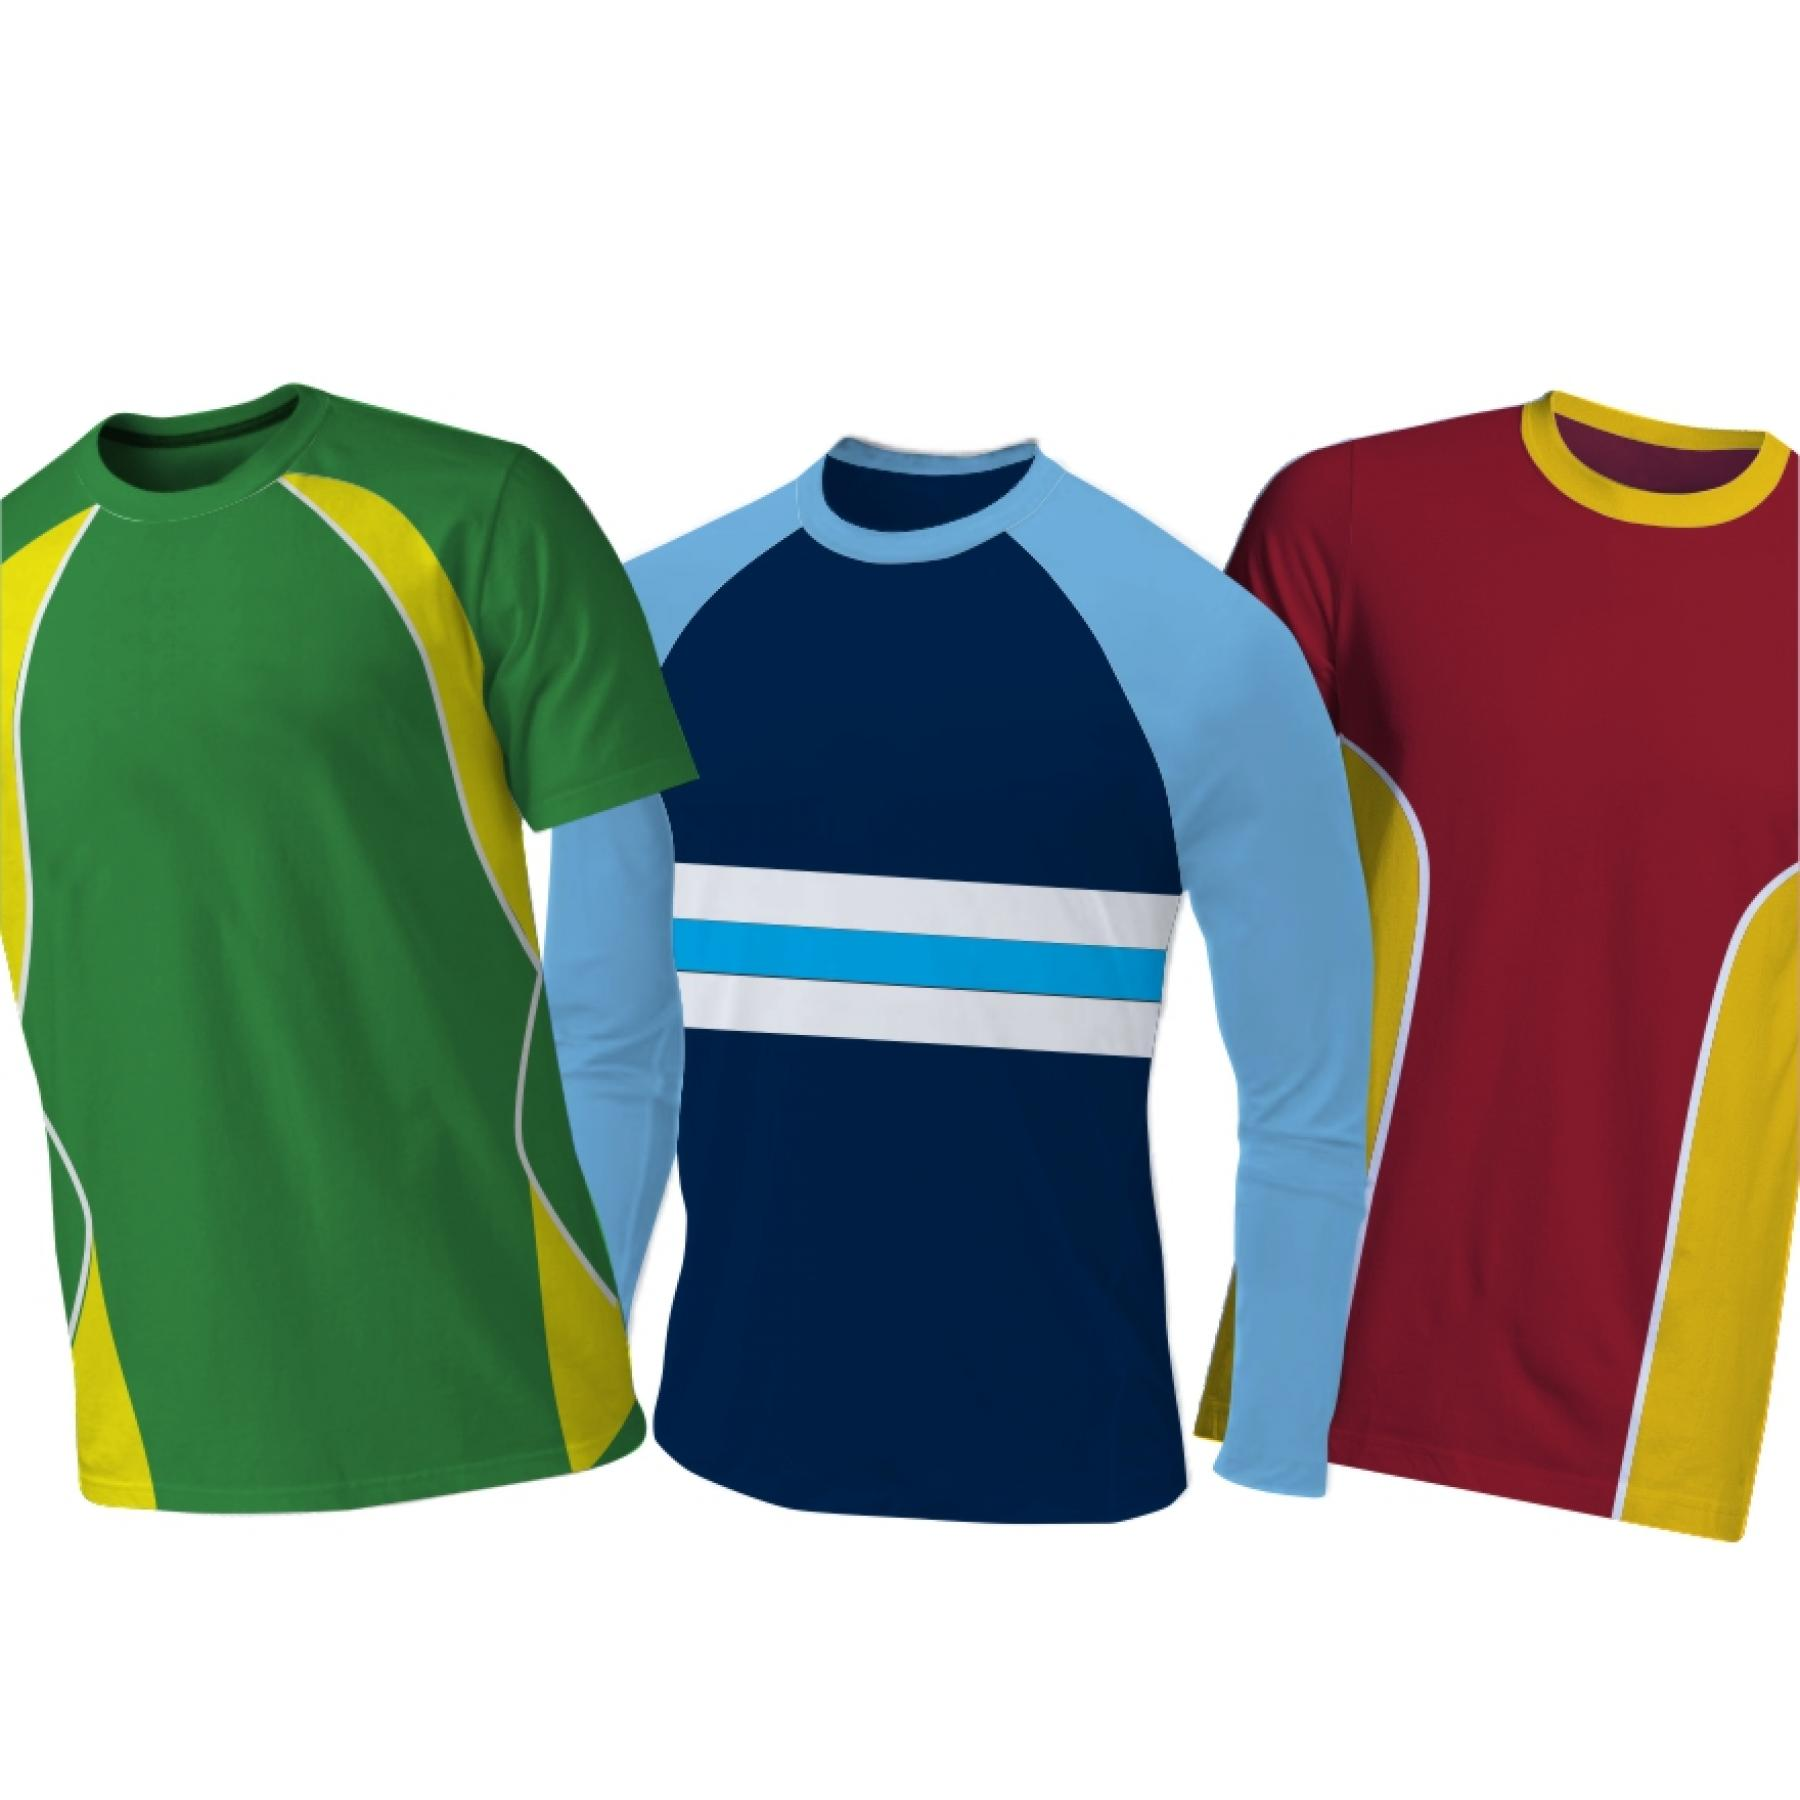 T-shirts Panelled